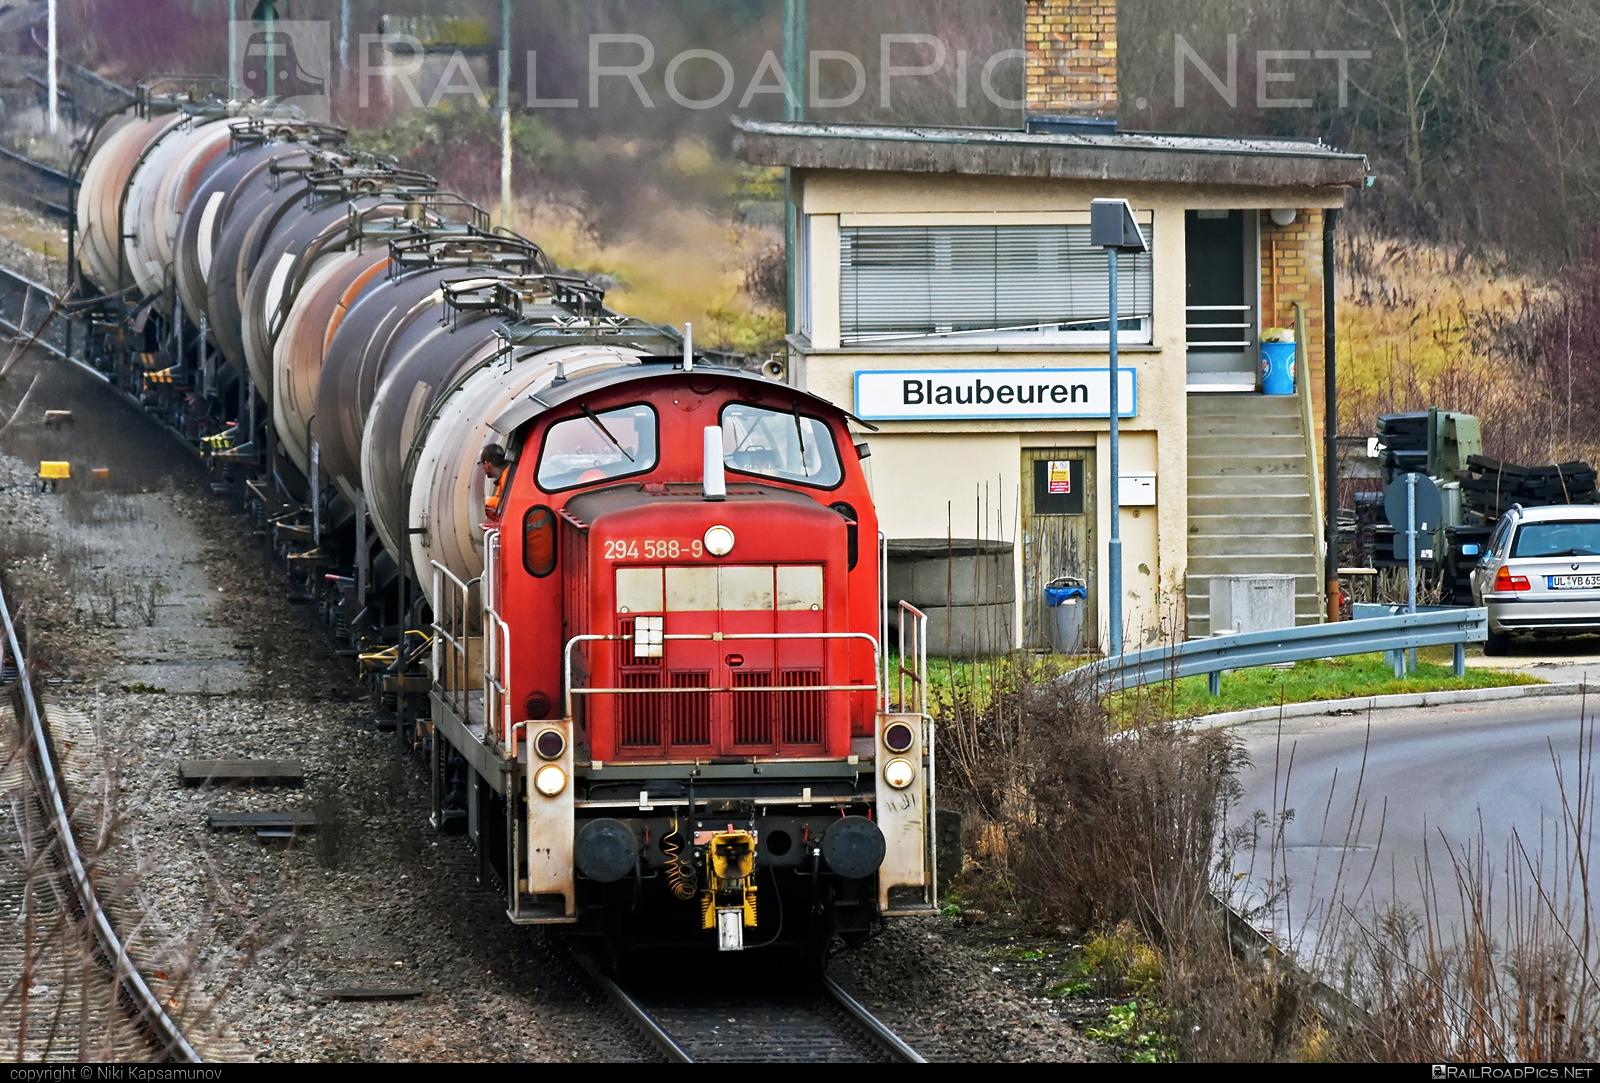 Deutz V90 - 294 588-9 operated by DB Cargo AG #db #dbcargo #dbcargoag #deutz #deutzv90 #kesselwagen #locomotiveclassv90 #makv90 #railion #tankwagon